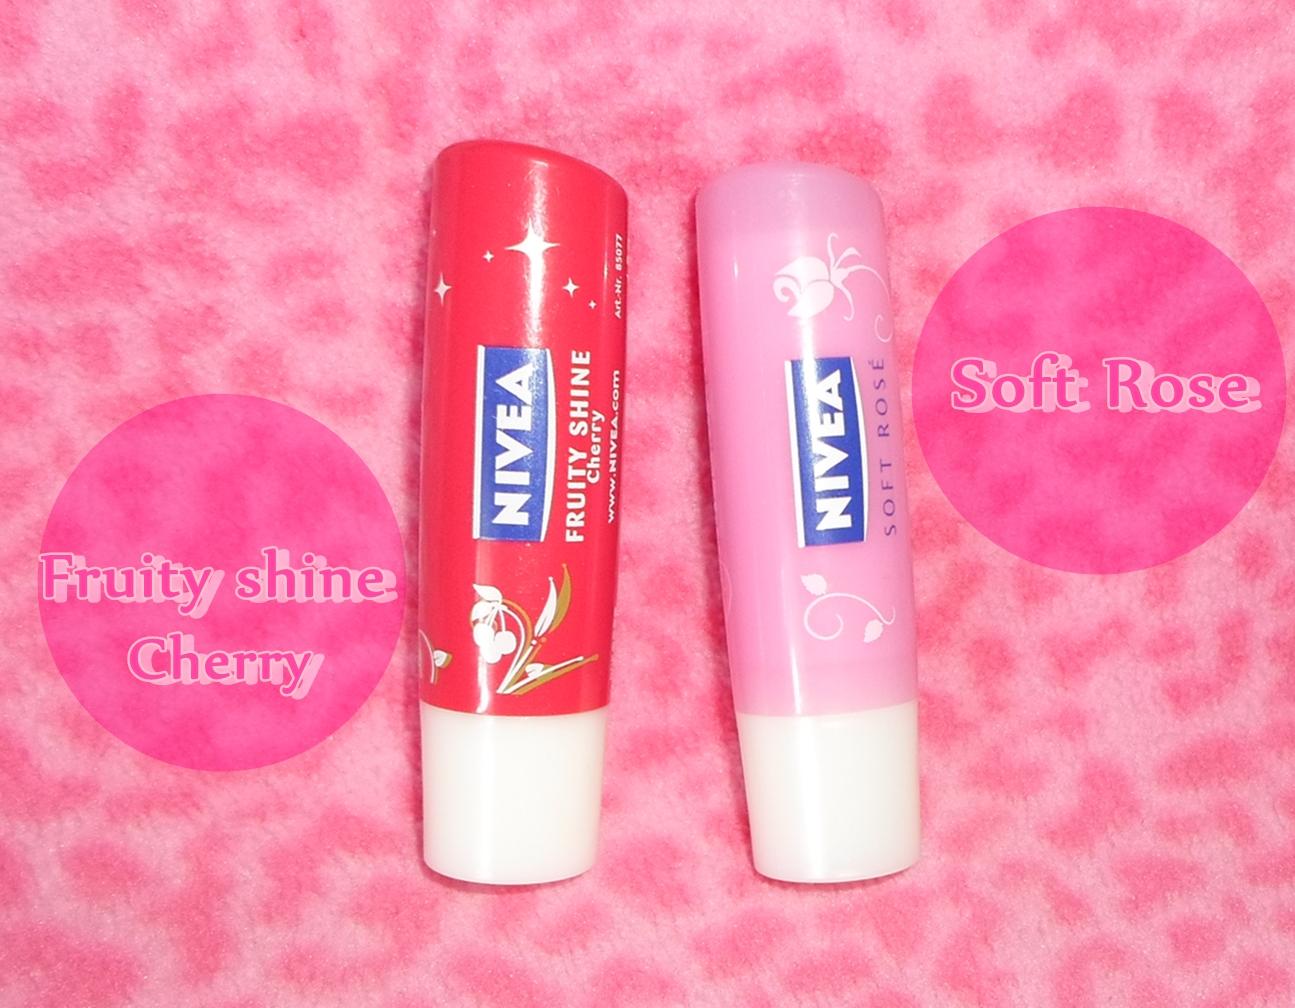 Nivea Battle Fruity Shine Vs Soft Rose Cat Eyes Red Lips Lip Balm 48g Image